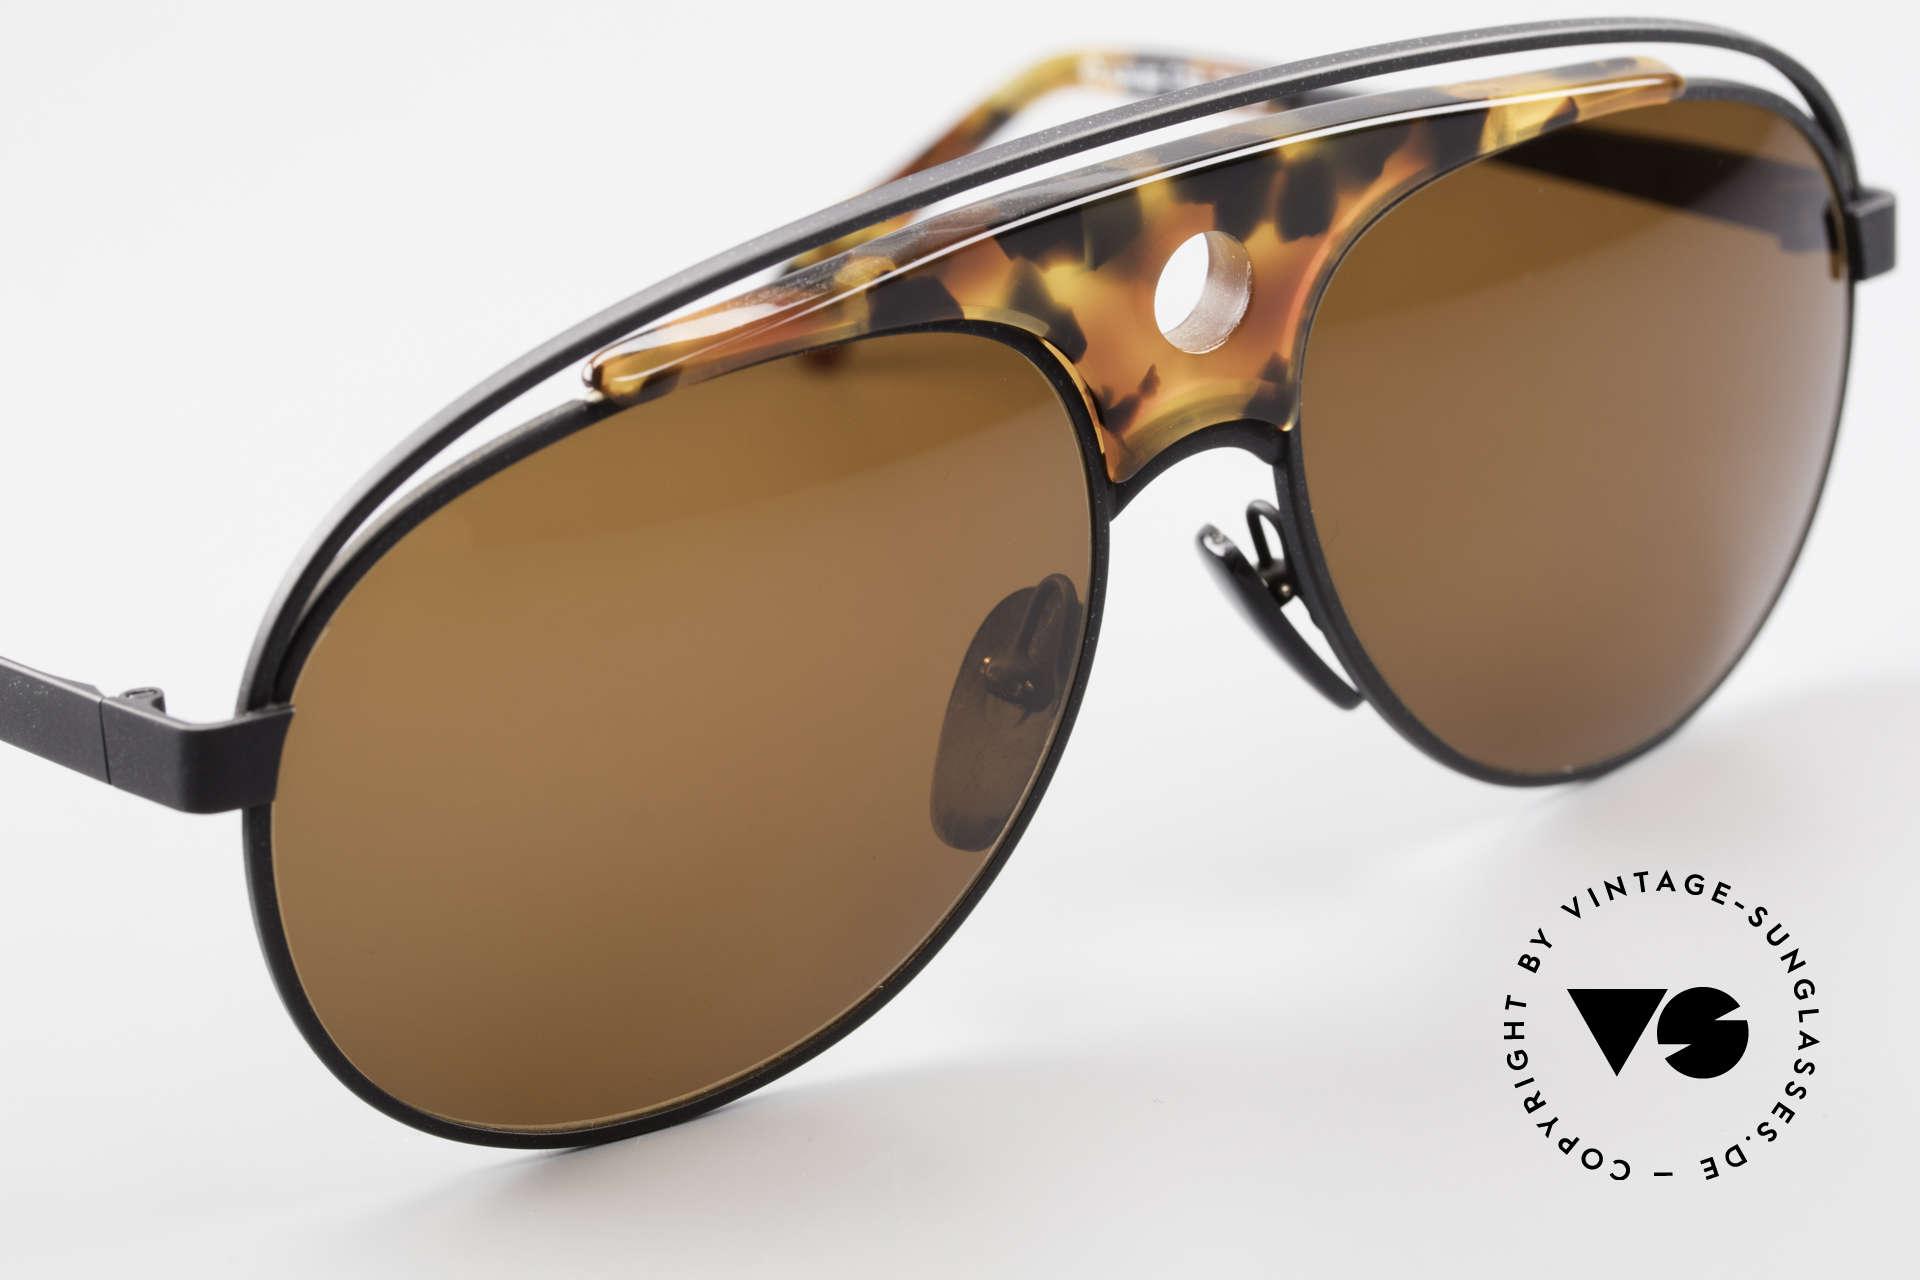 Alain Mikli 633 / 0013 Lenny Kravitz Sunglasses 80's, unworn, one of a kind (like all our vintage Alain Mikli), Made for Men